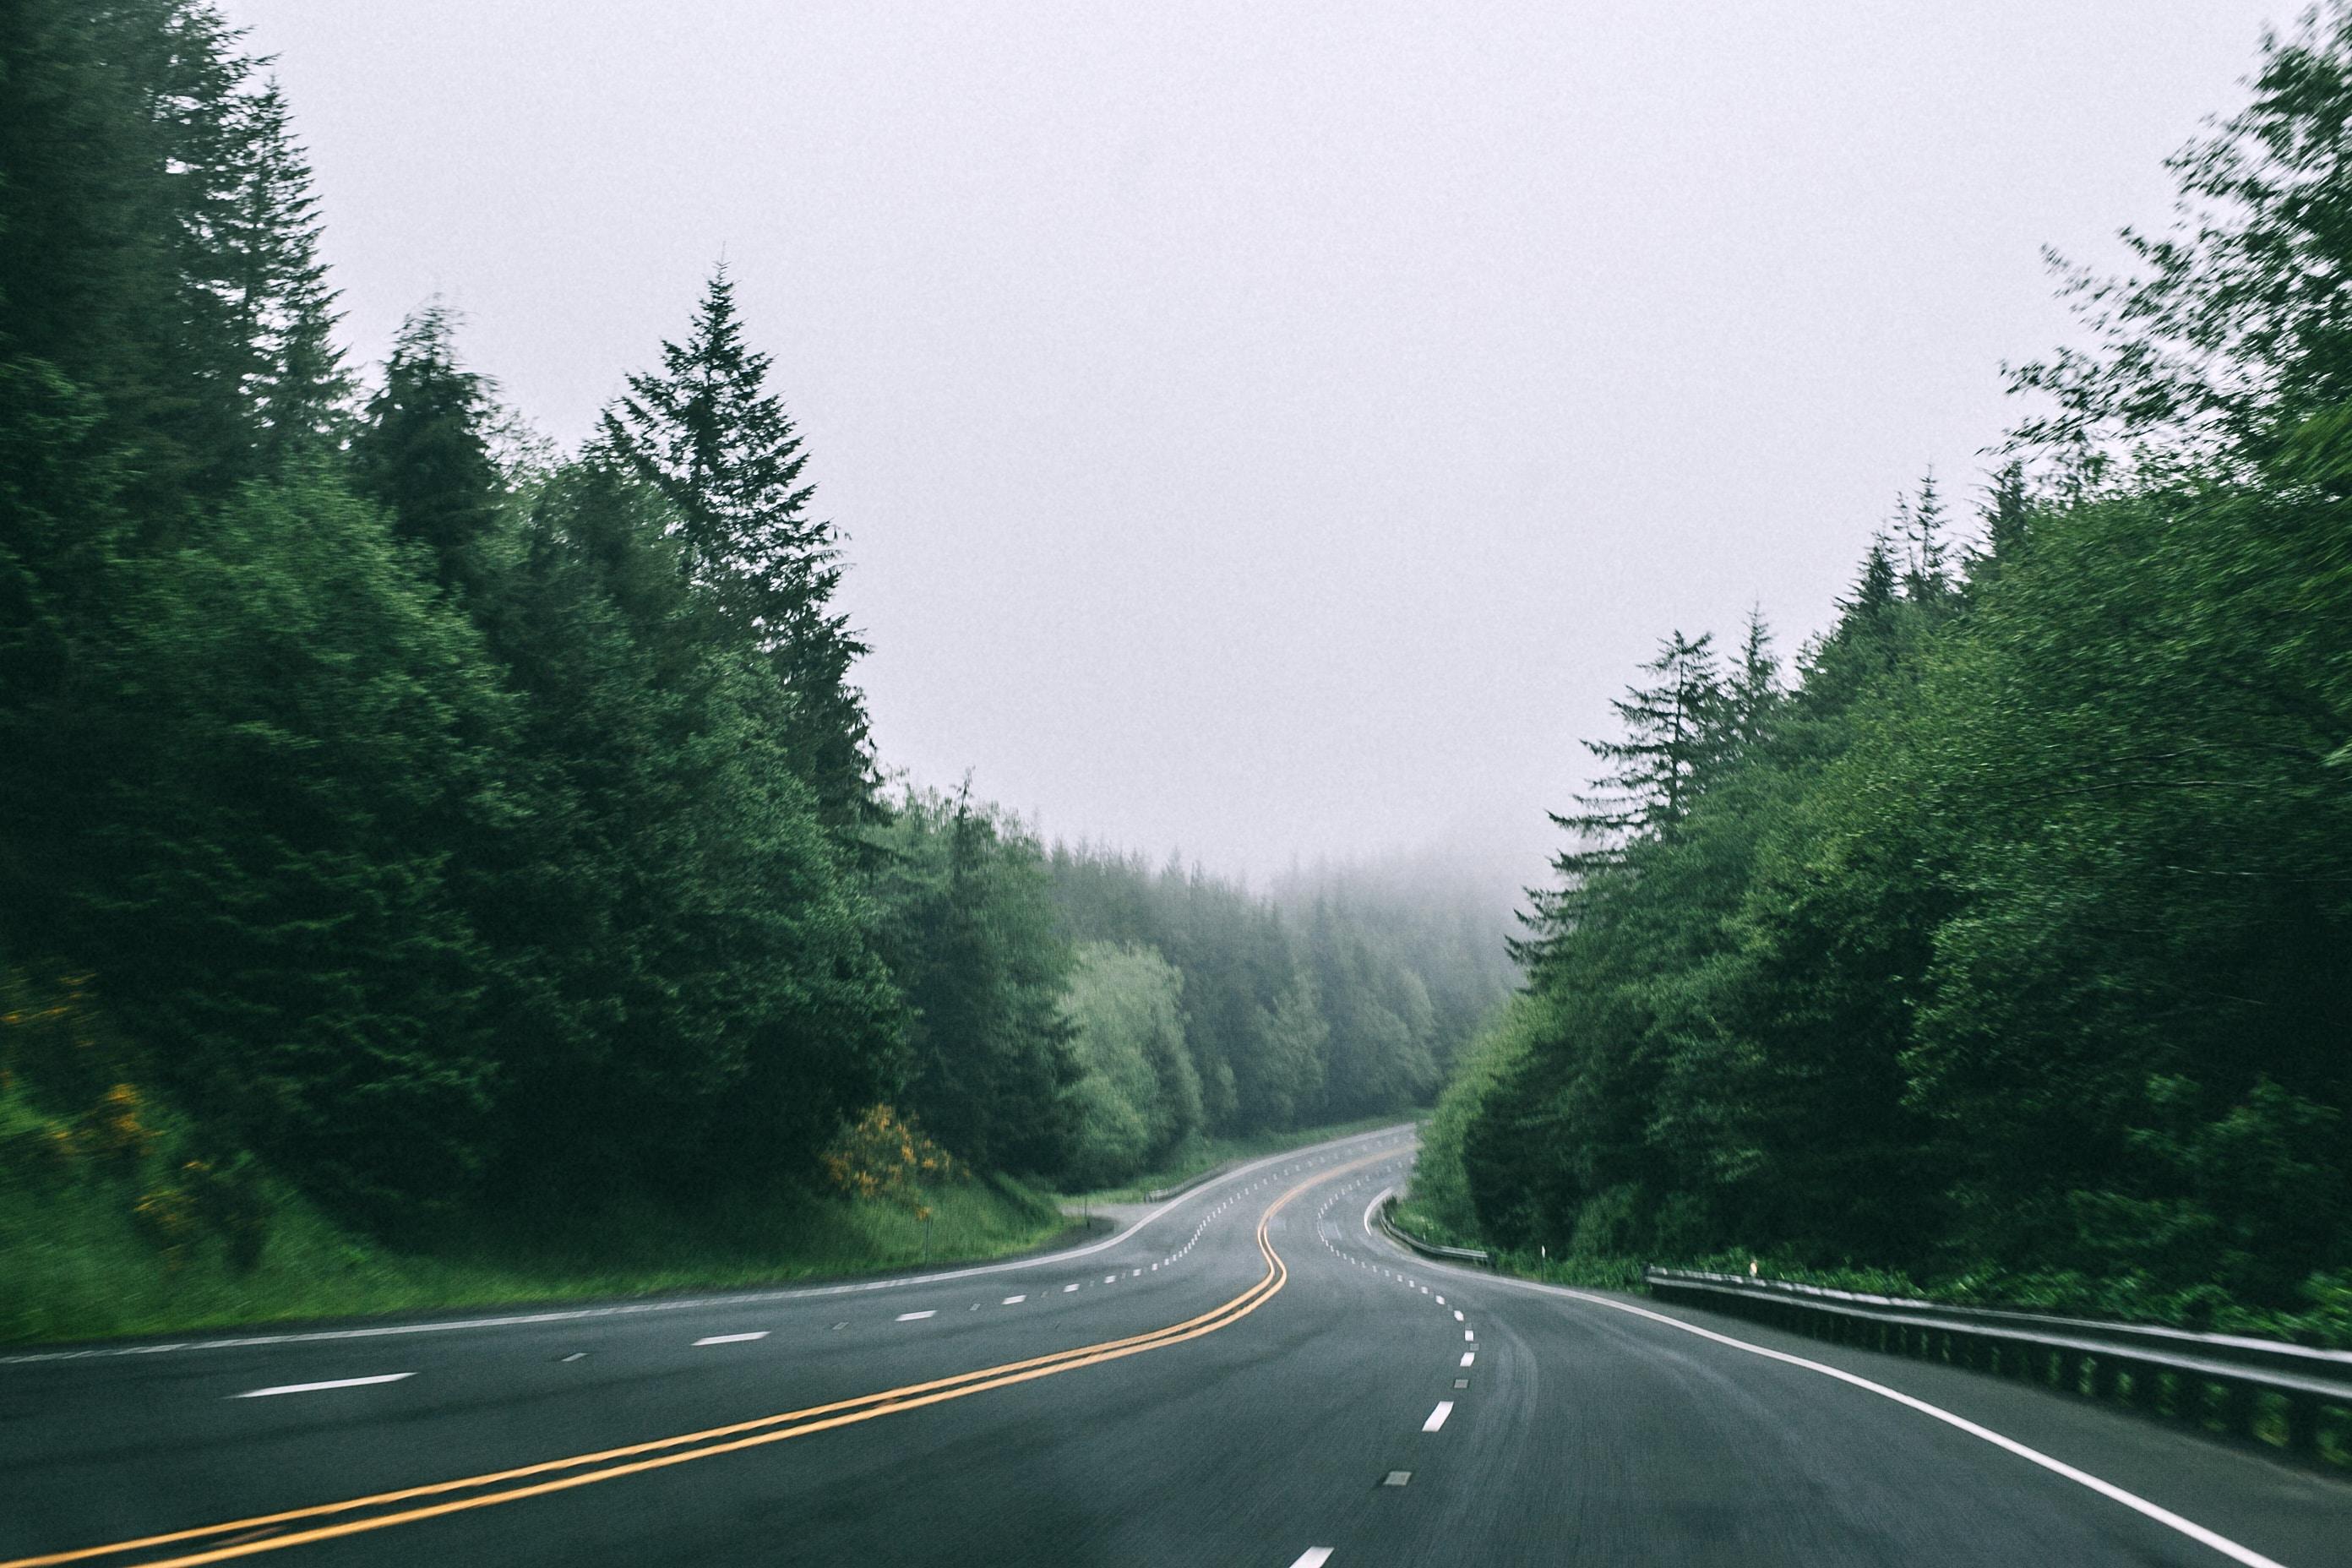 black asphalt road in between trees with foggy weather